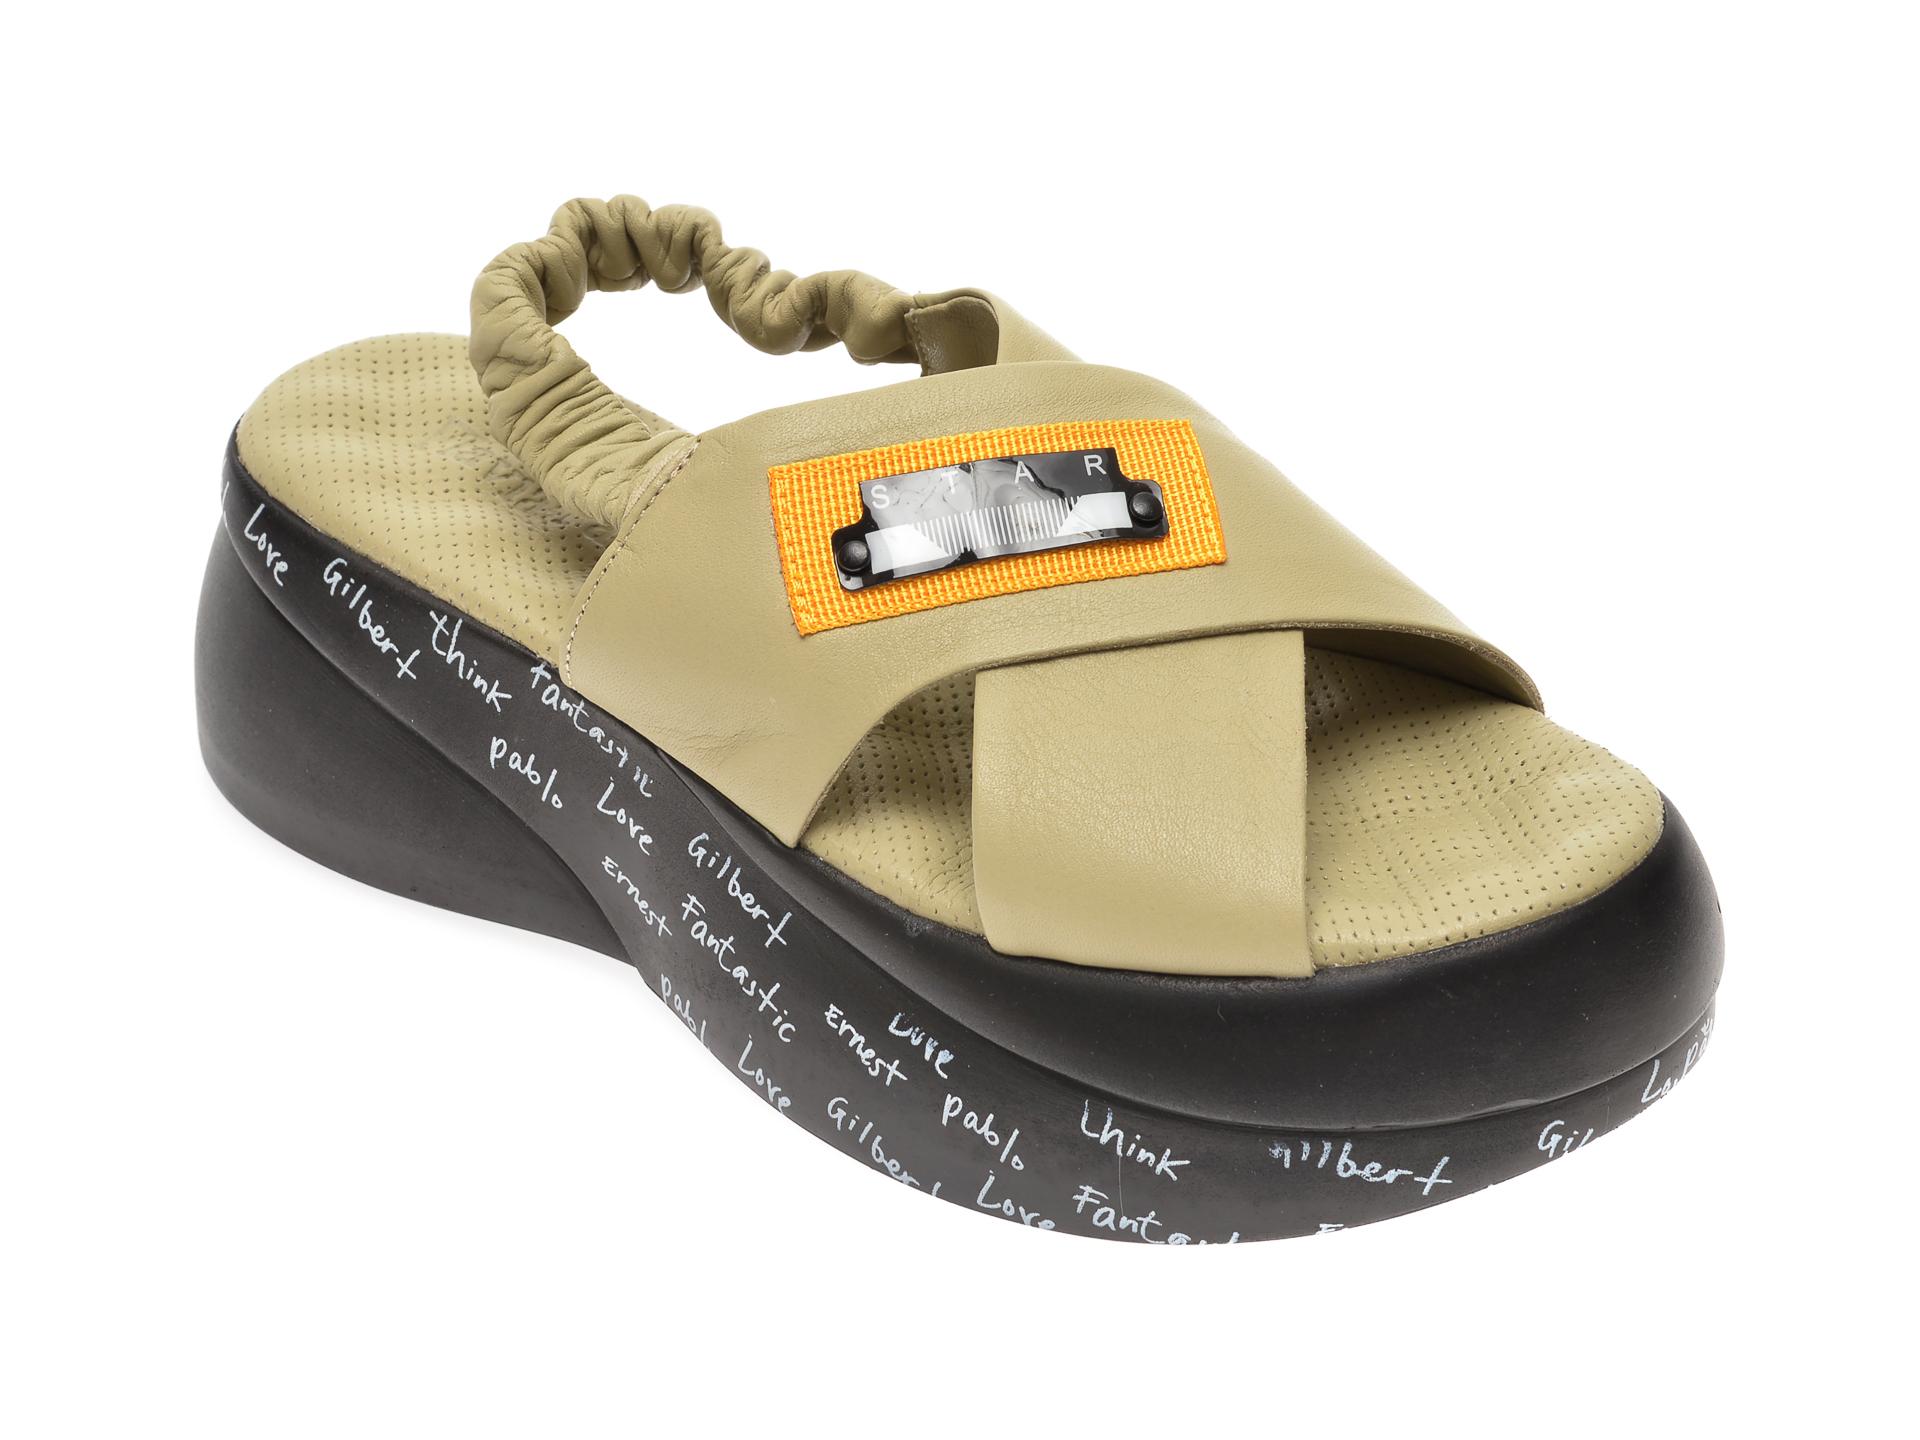 Sandale FLAVIA PASSINI verzi, 4261931, din piele naturala